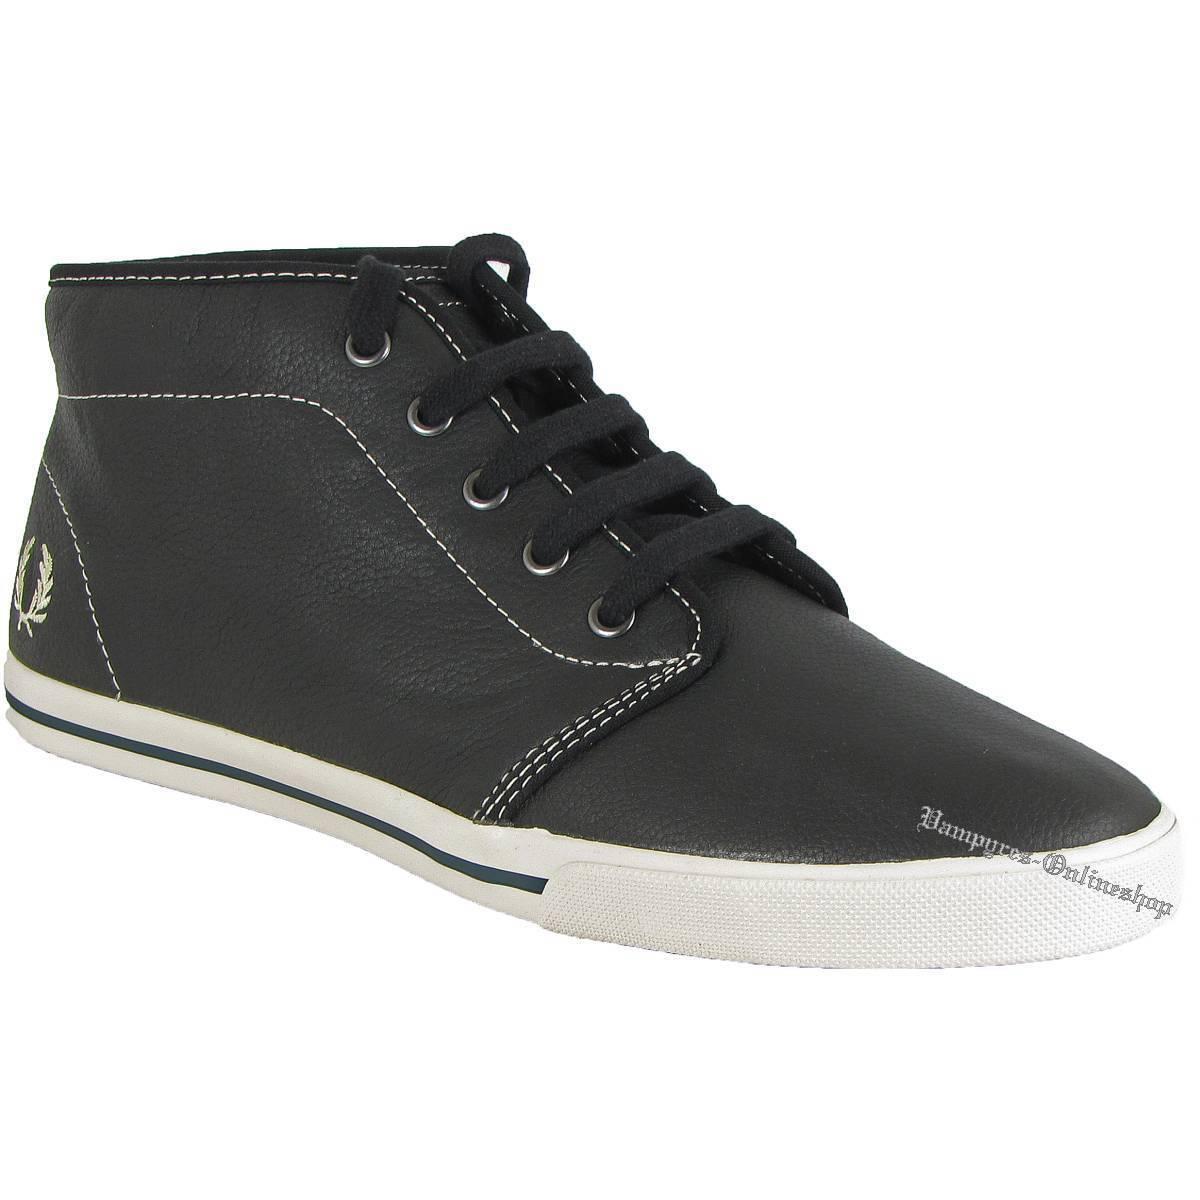 Fred Perry Fletcher Black Leather Sneaker B8209 Schwarz Leder Turnschuhe Schuhe